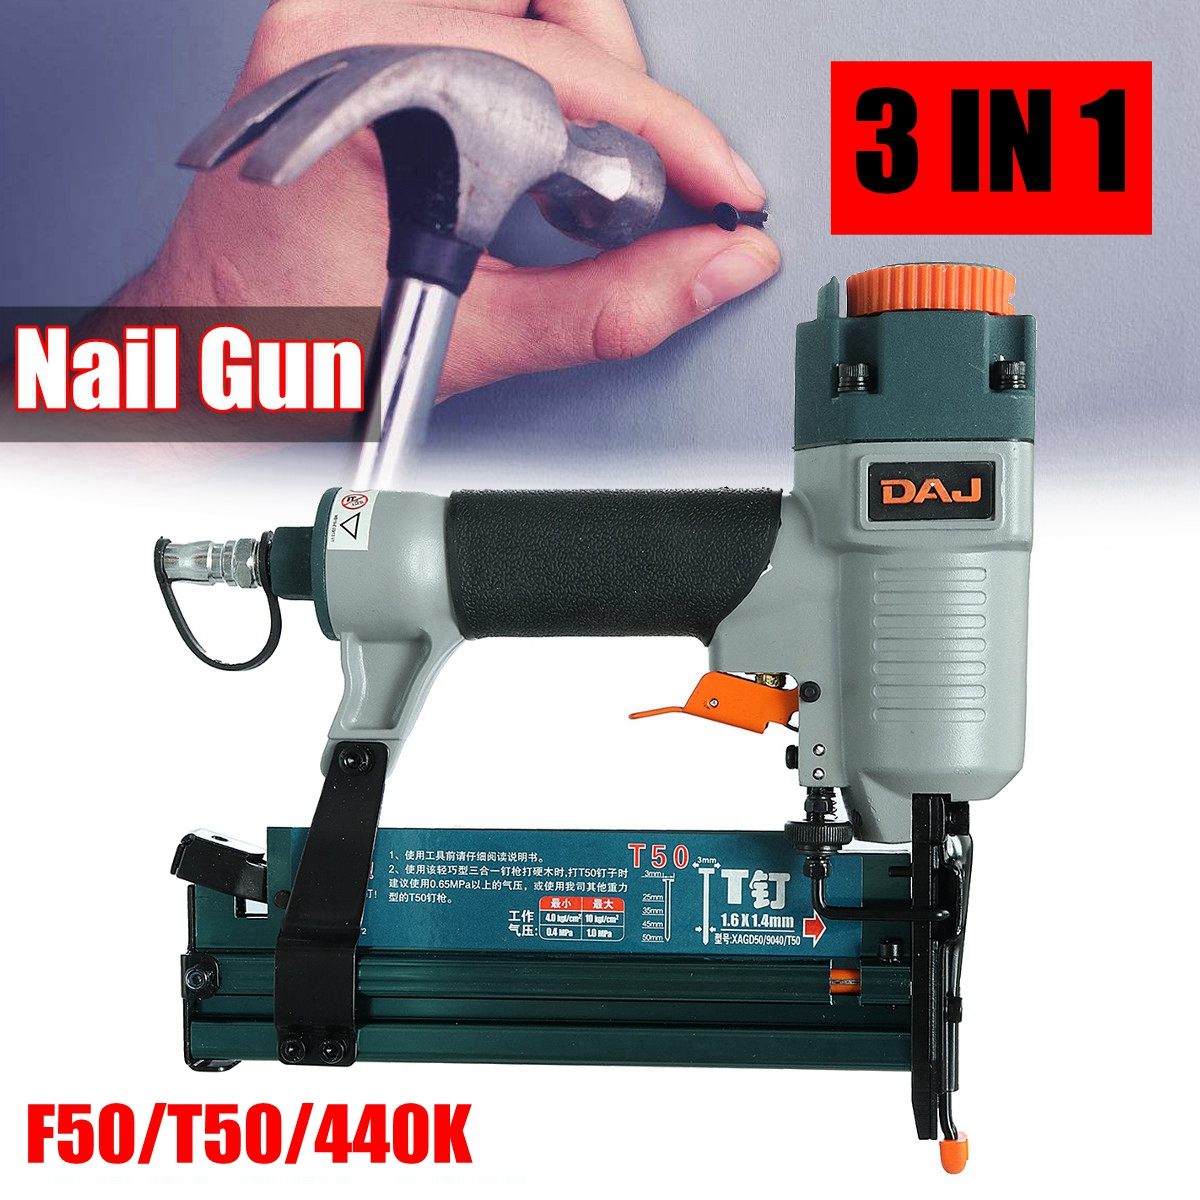 Portable 3 In1 Air Brad Nail G un Stapler Finish Nailer Pneumatic Finishing Nail Tool For T50 F50 440K 18ga pneumatic brad nailer gun f50 not include the custom tax